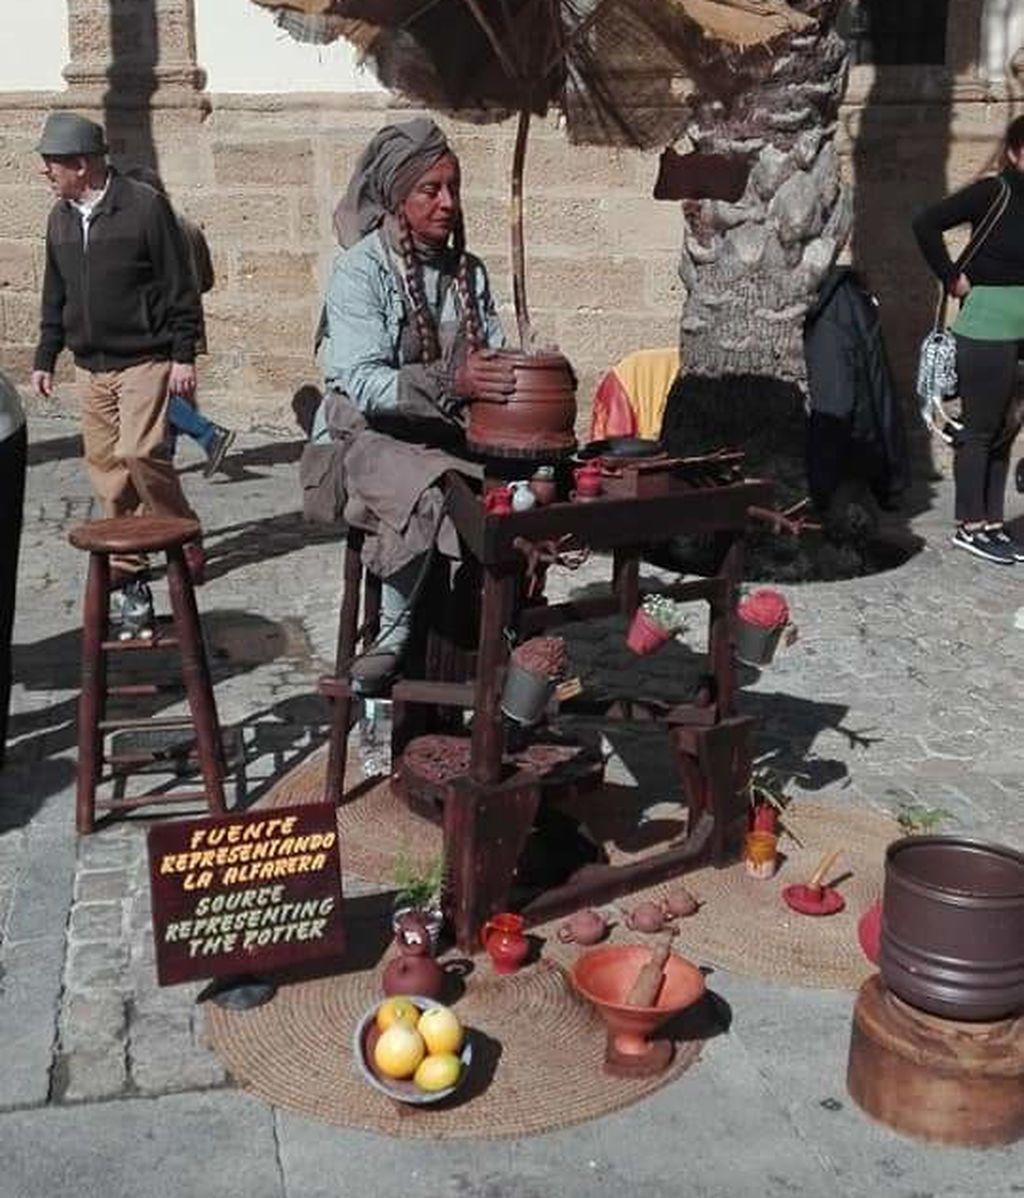 La mujer de César, Alicia, es la alfarera de la plaza Lope de Vega